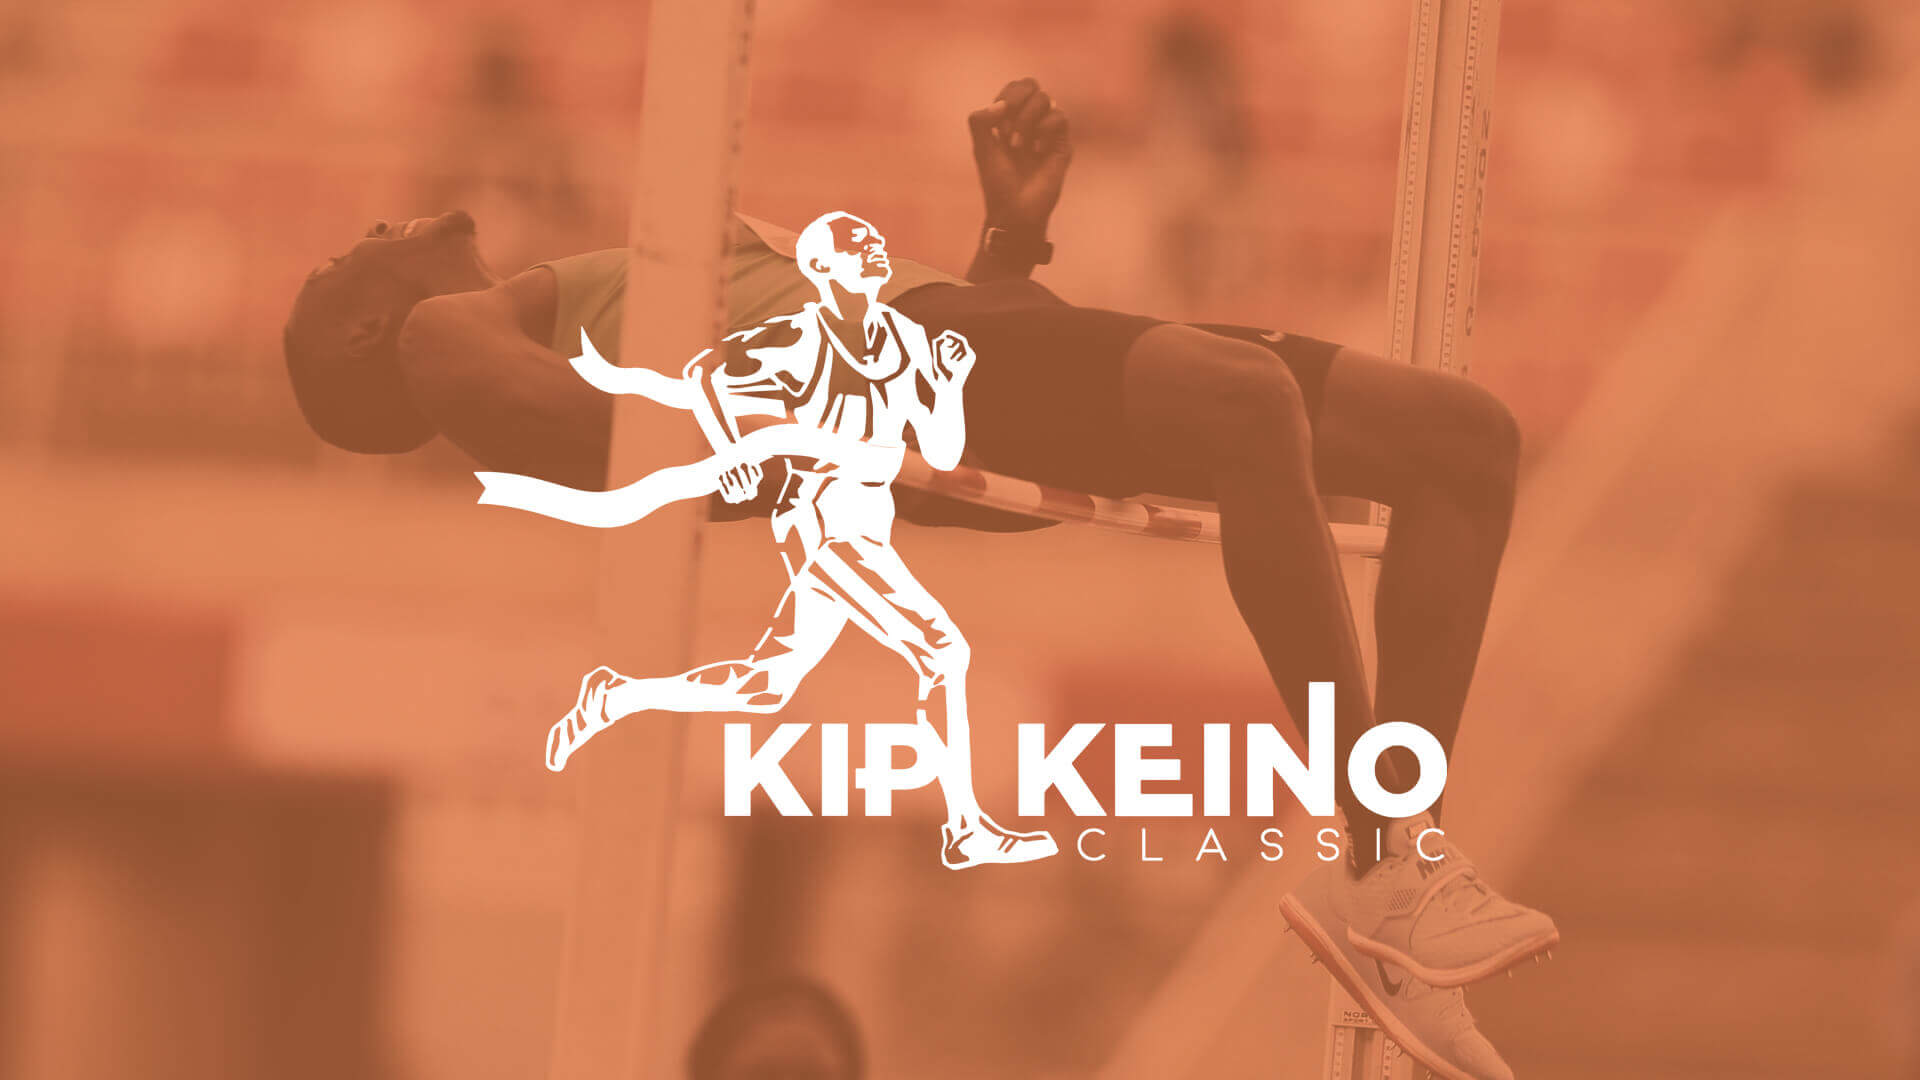 Kip Keino Classic